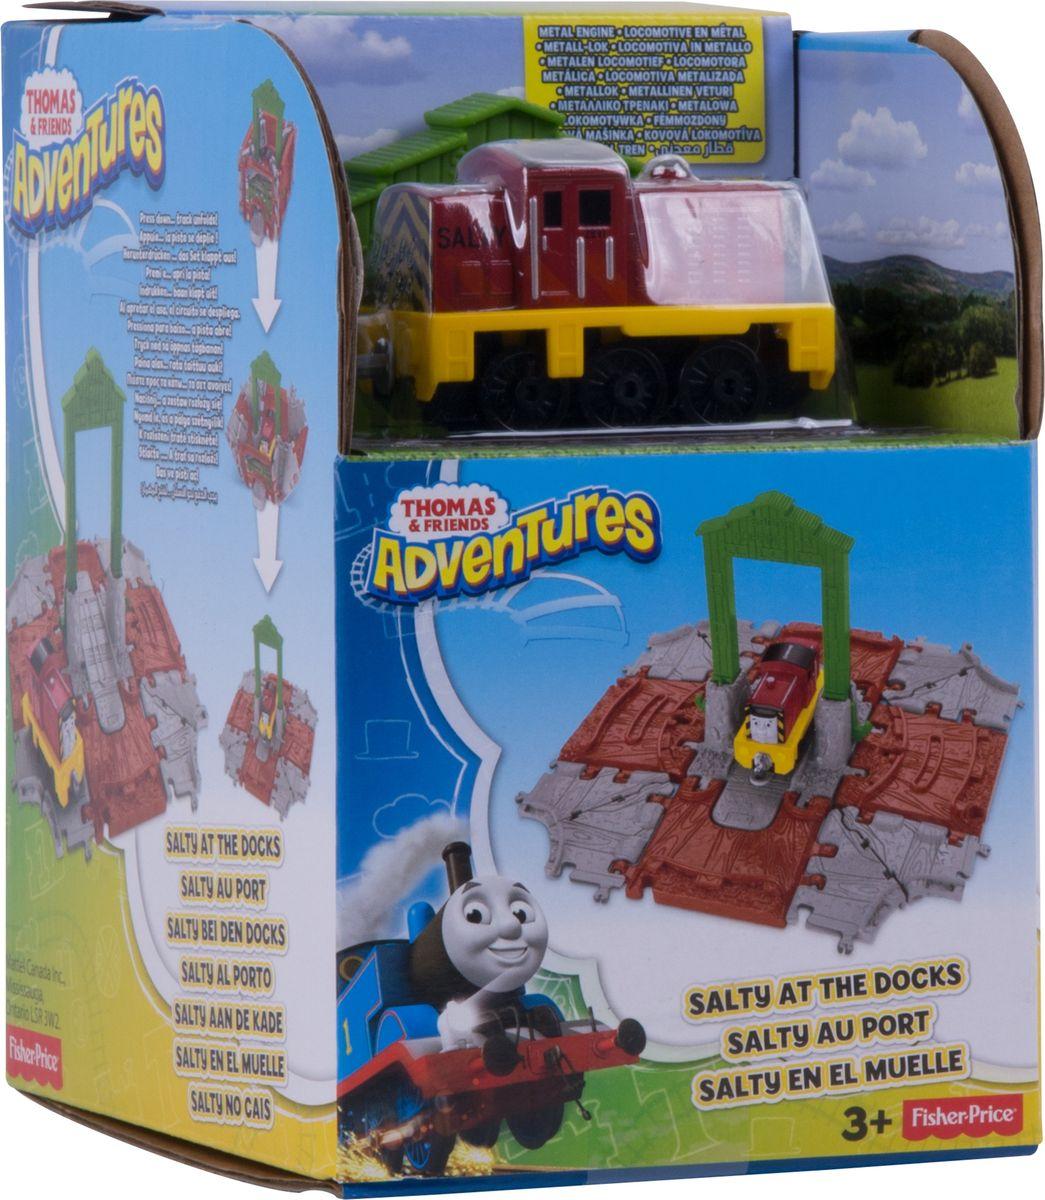 Thomas & Friends Железная дорога Куб Солти thomas & friends железная дорога чарли за работой